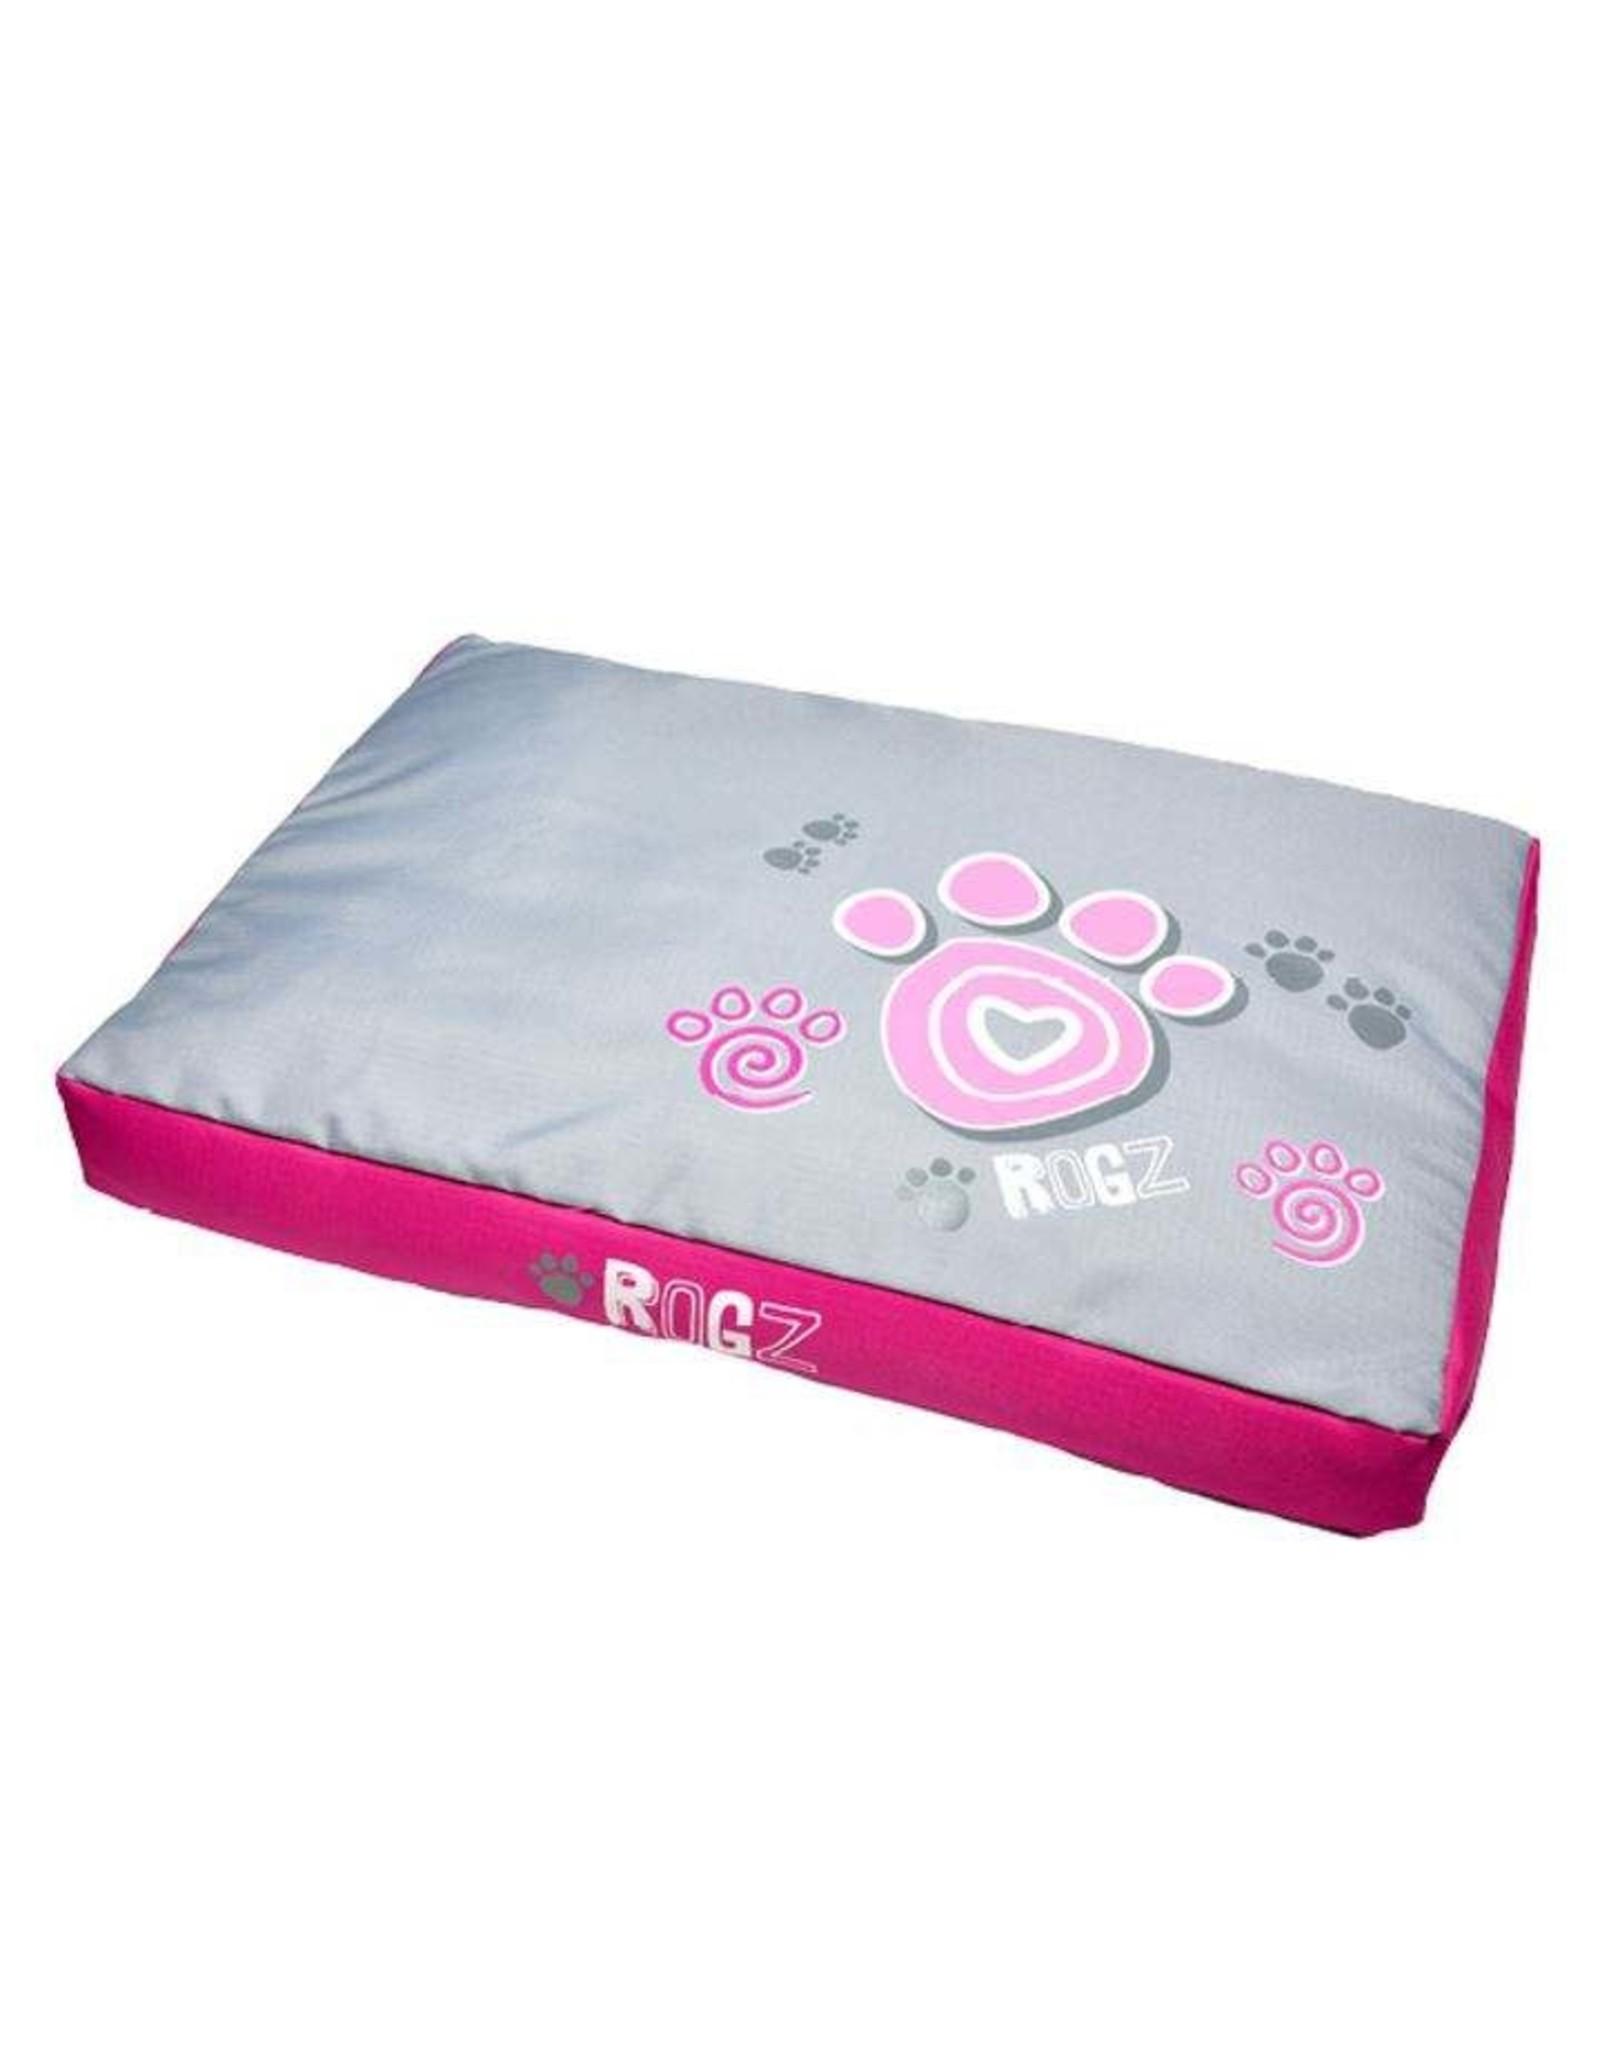 "Rogz Flat Podz - Pink Paw - Medium - 33"" x 22"" x 4"""